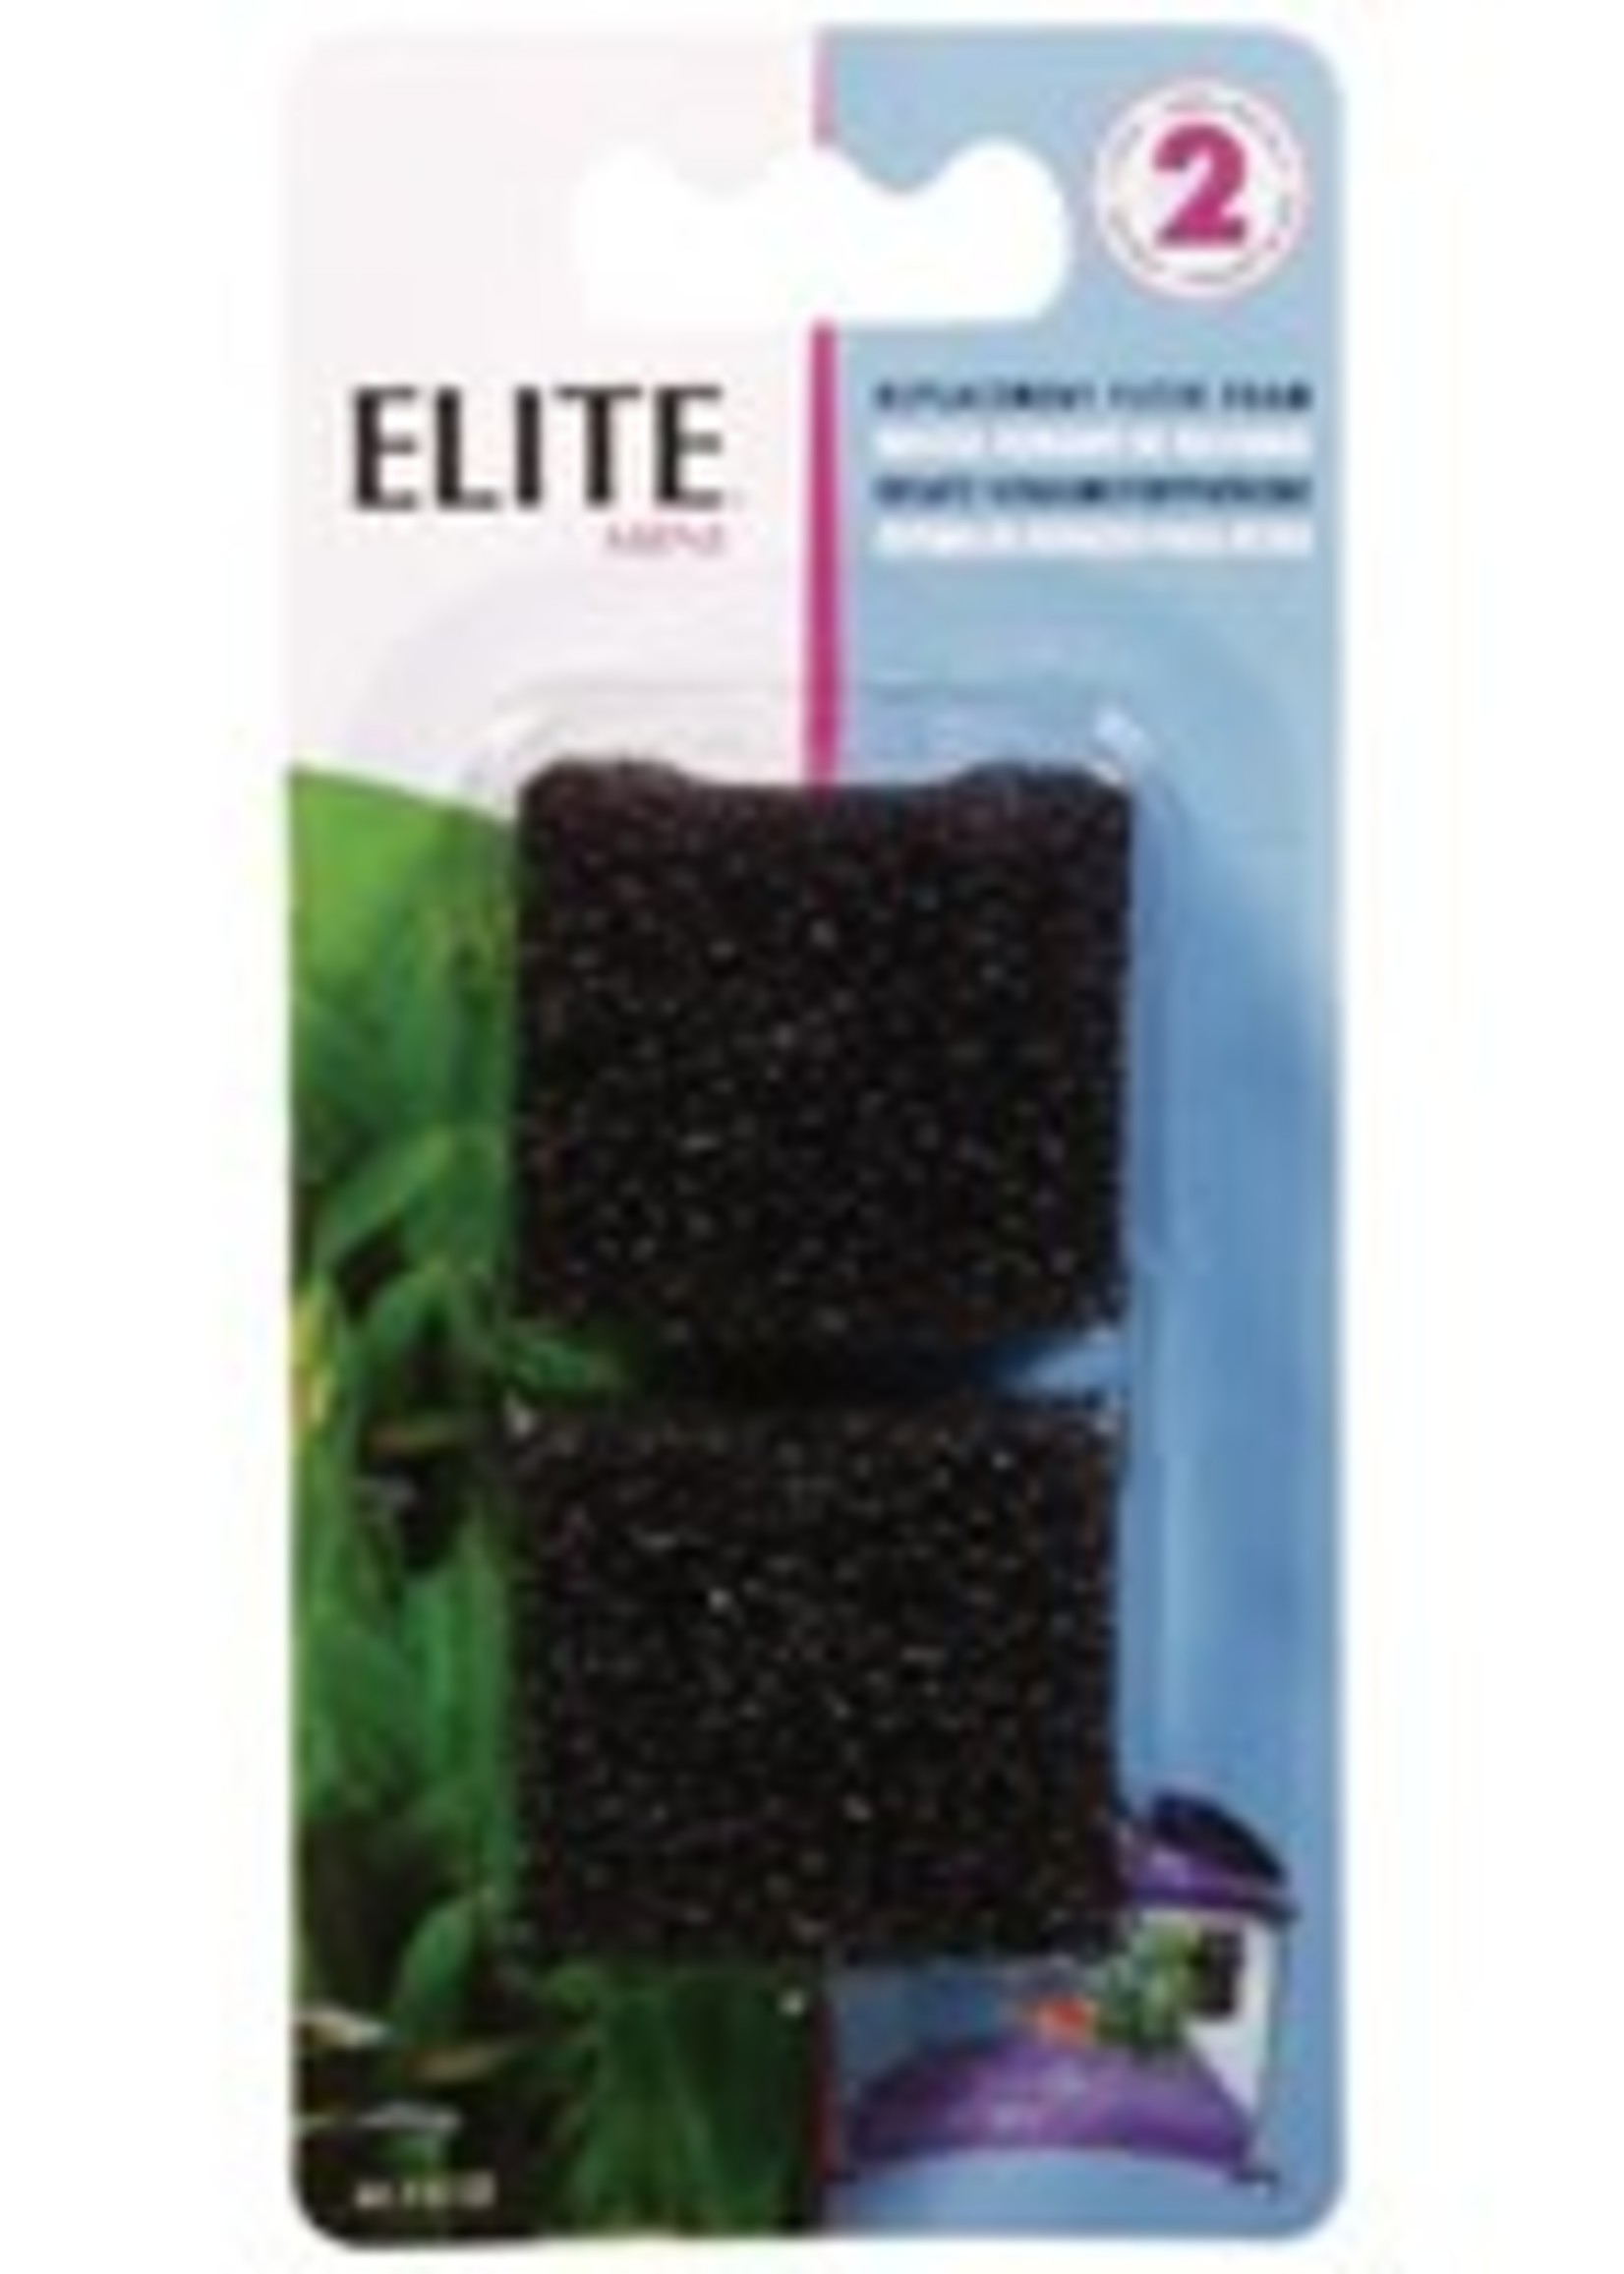 Elite Replacement Mini Foam Filter Inserts - 2 pack